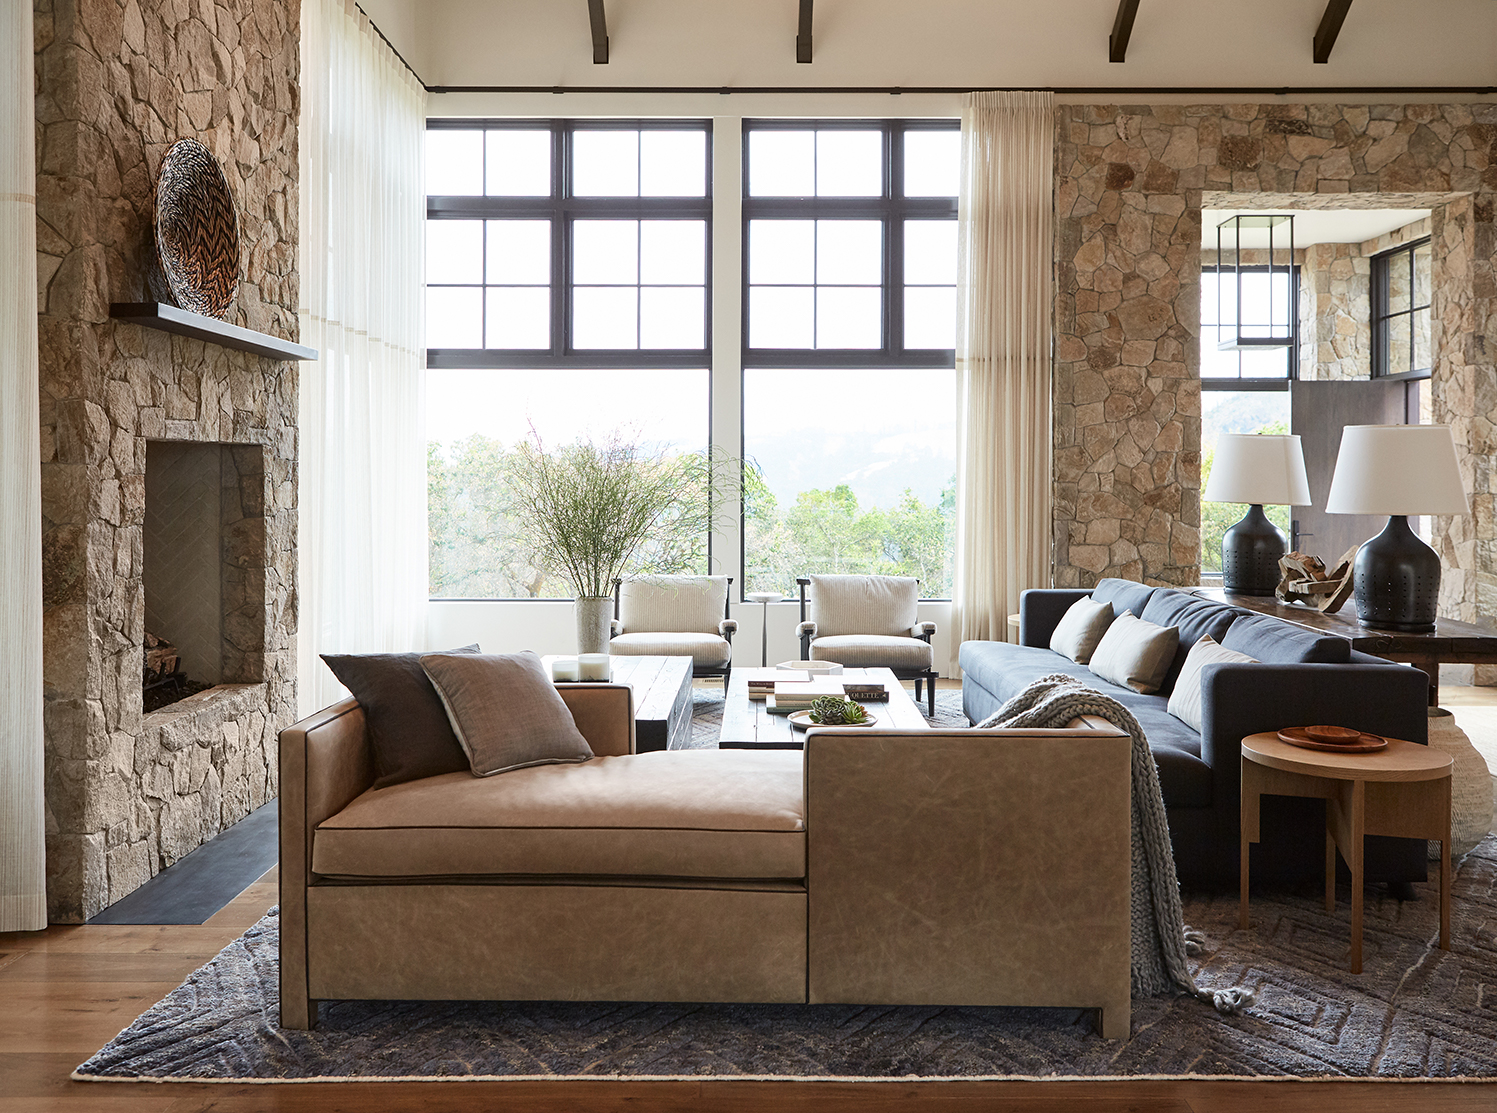 Jennifer_robins_interiors_projects_calistoga_JRI.MtnHomeRanch_016_1_living_room_LR_fireplace